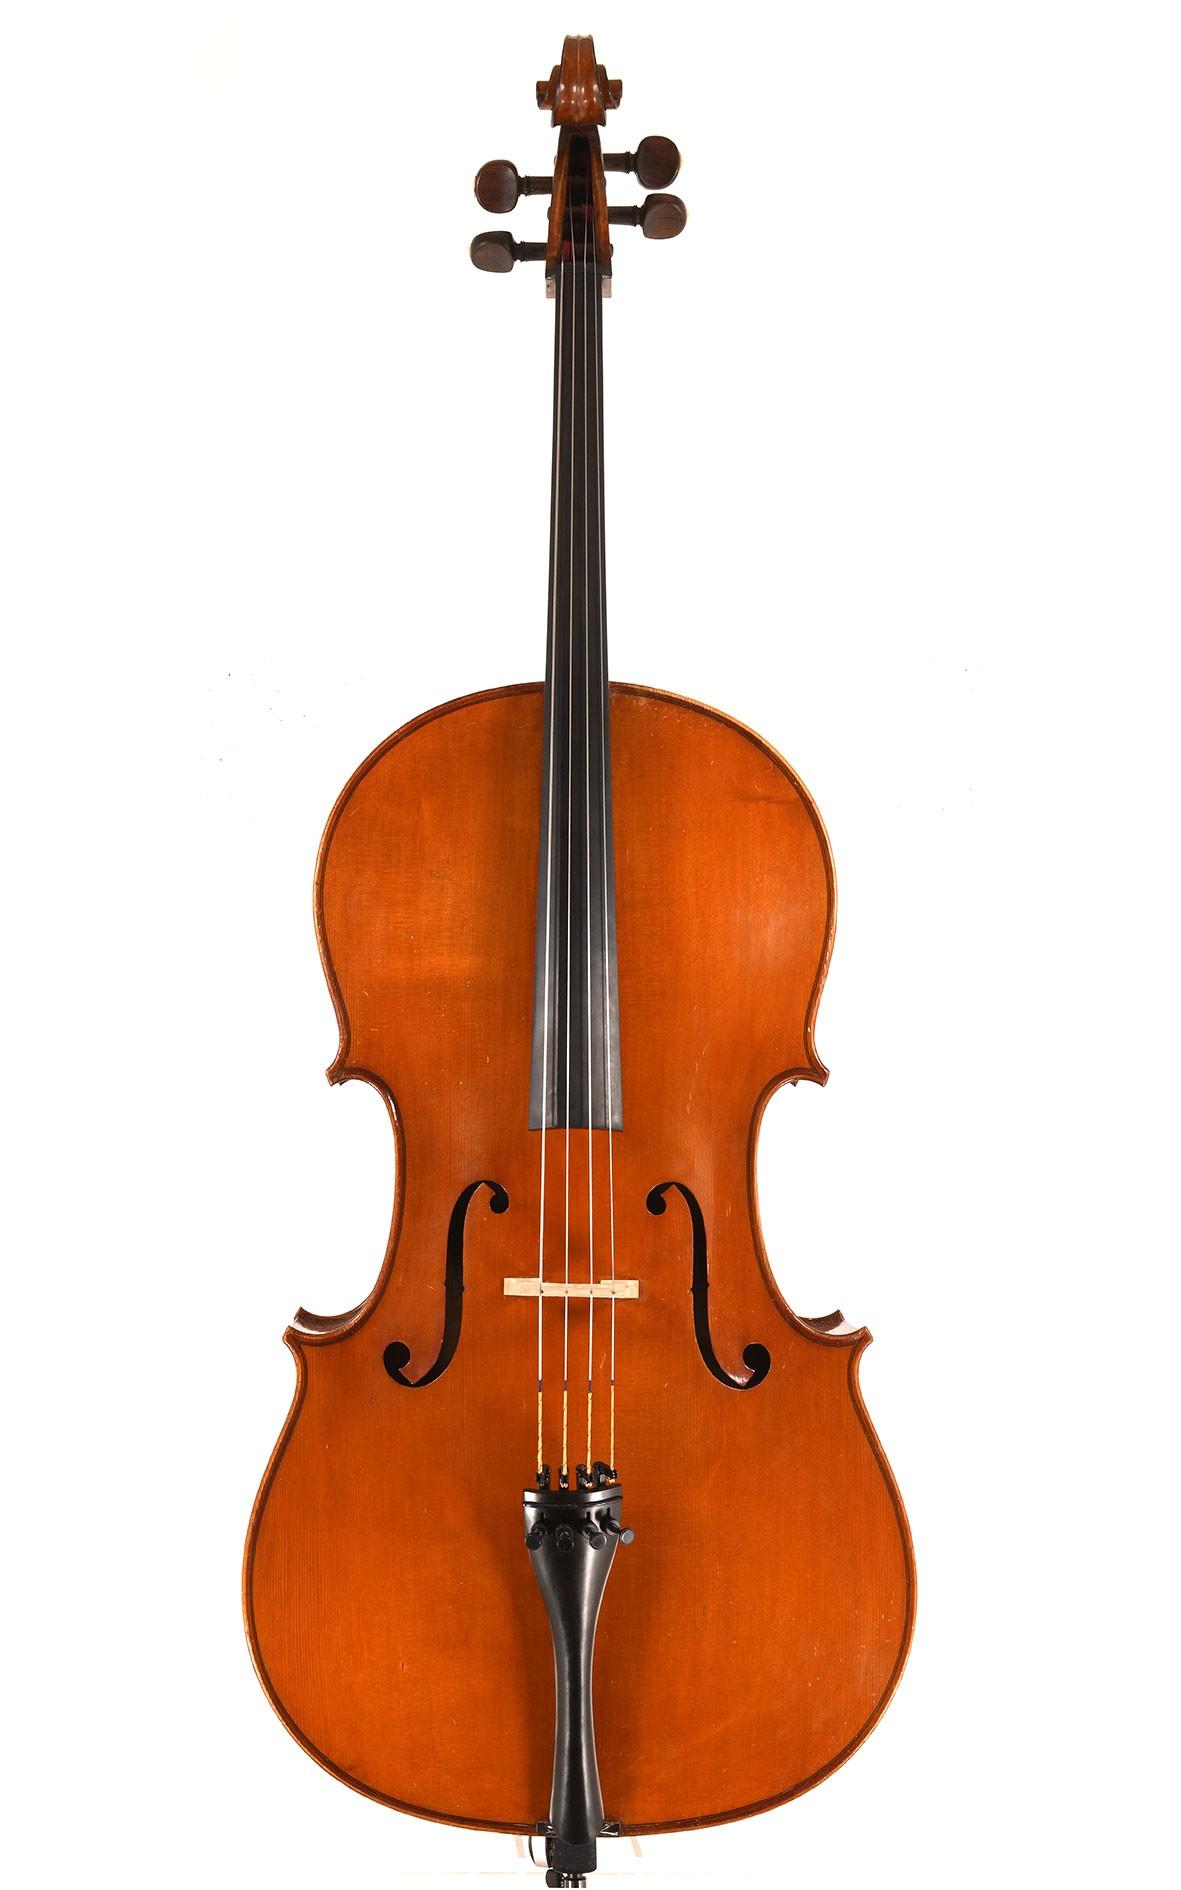 Collin-Mézin fils的精美大提琴,Mirecourt